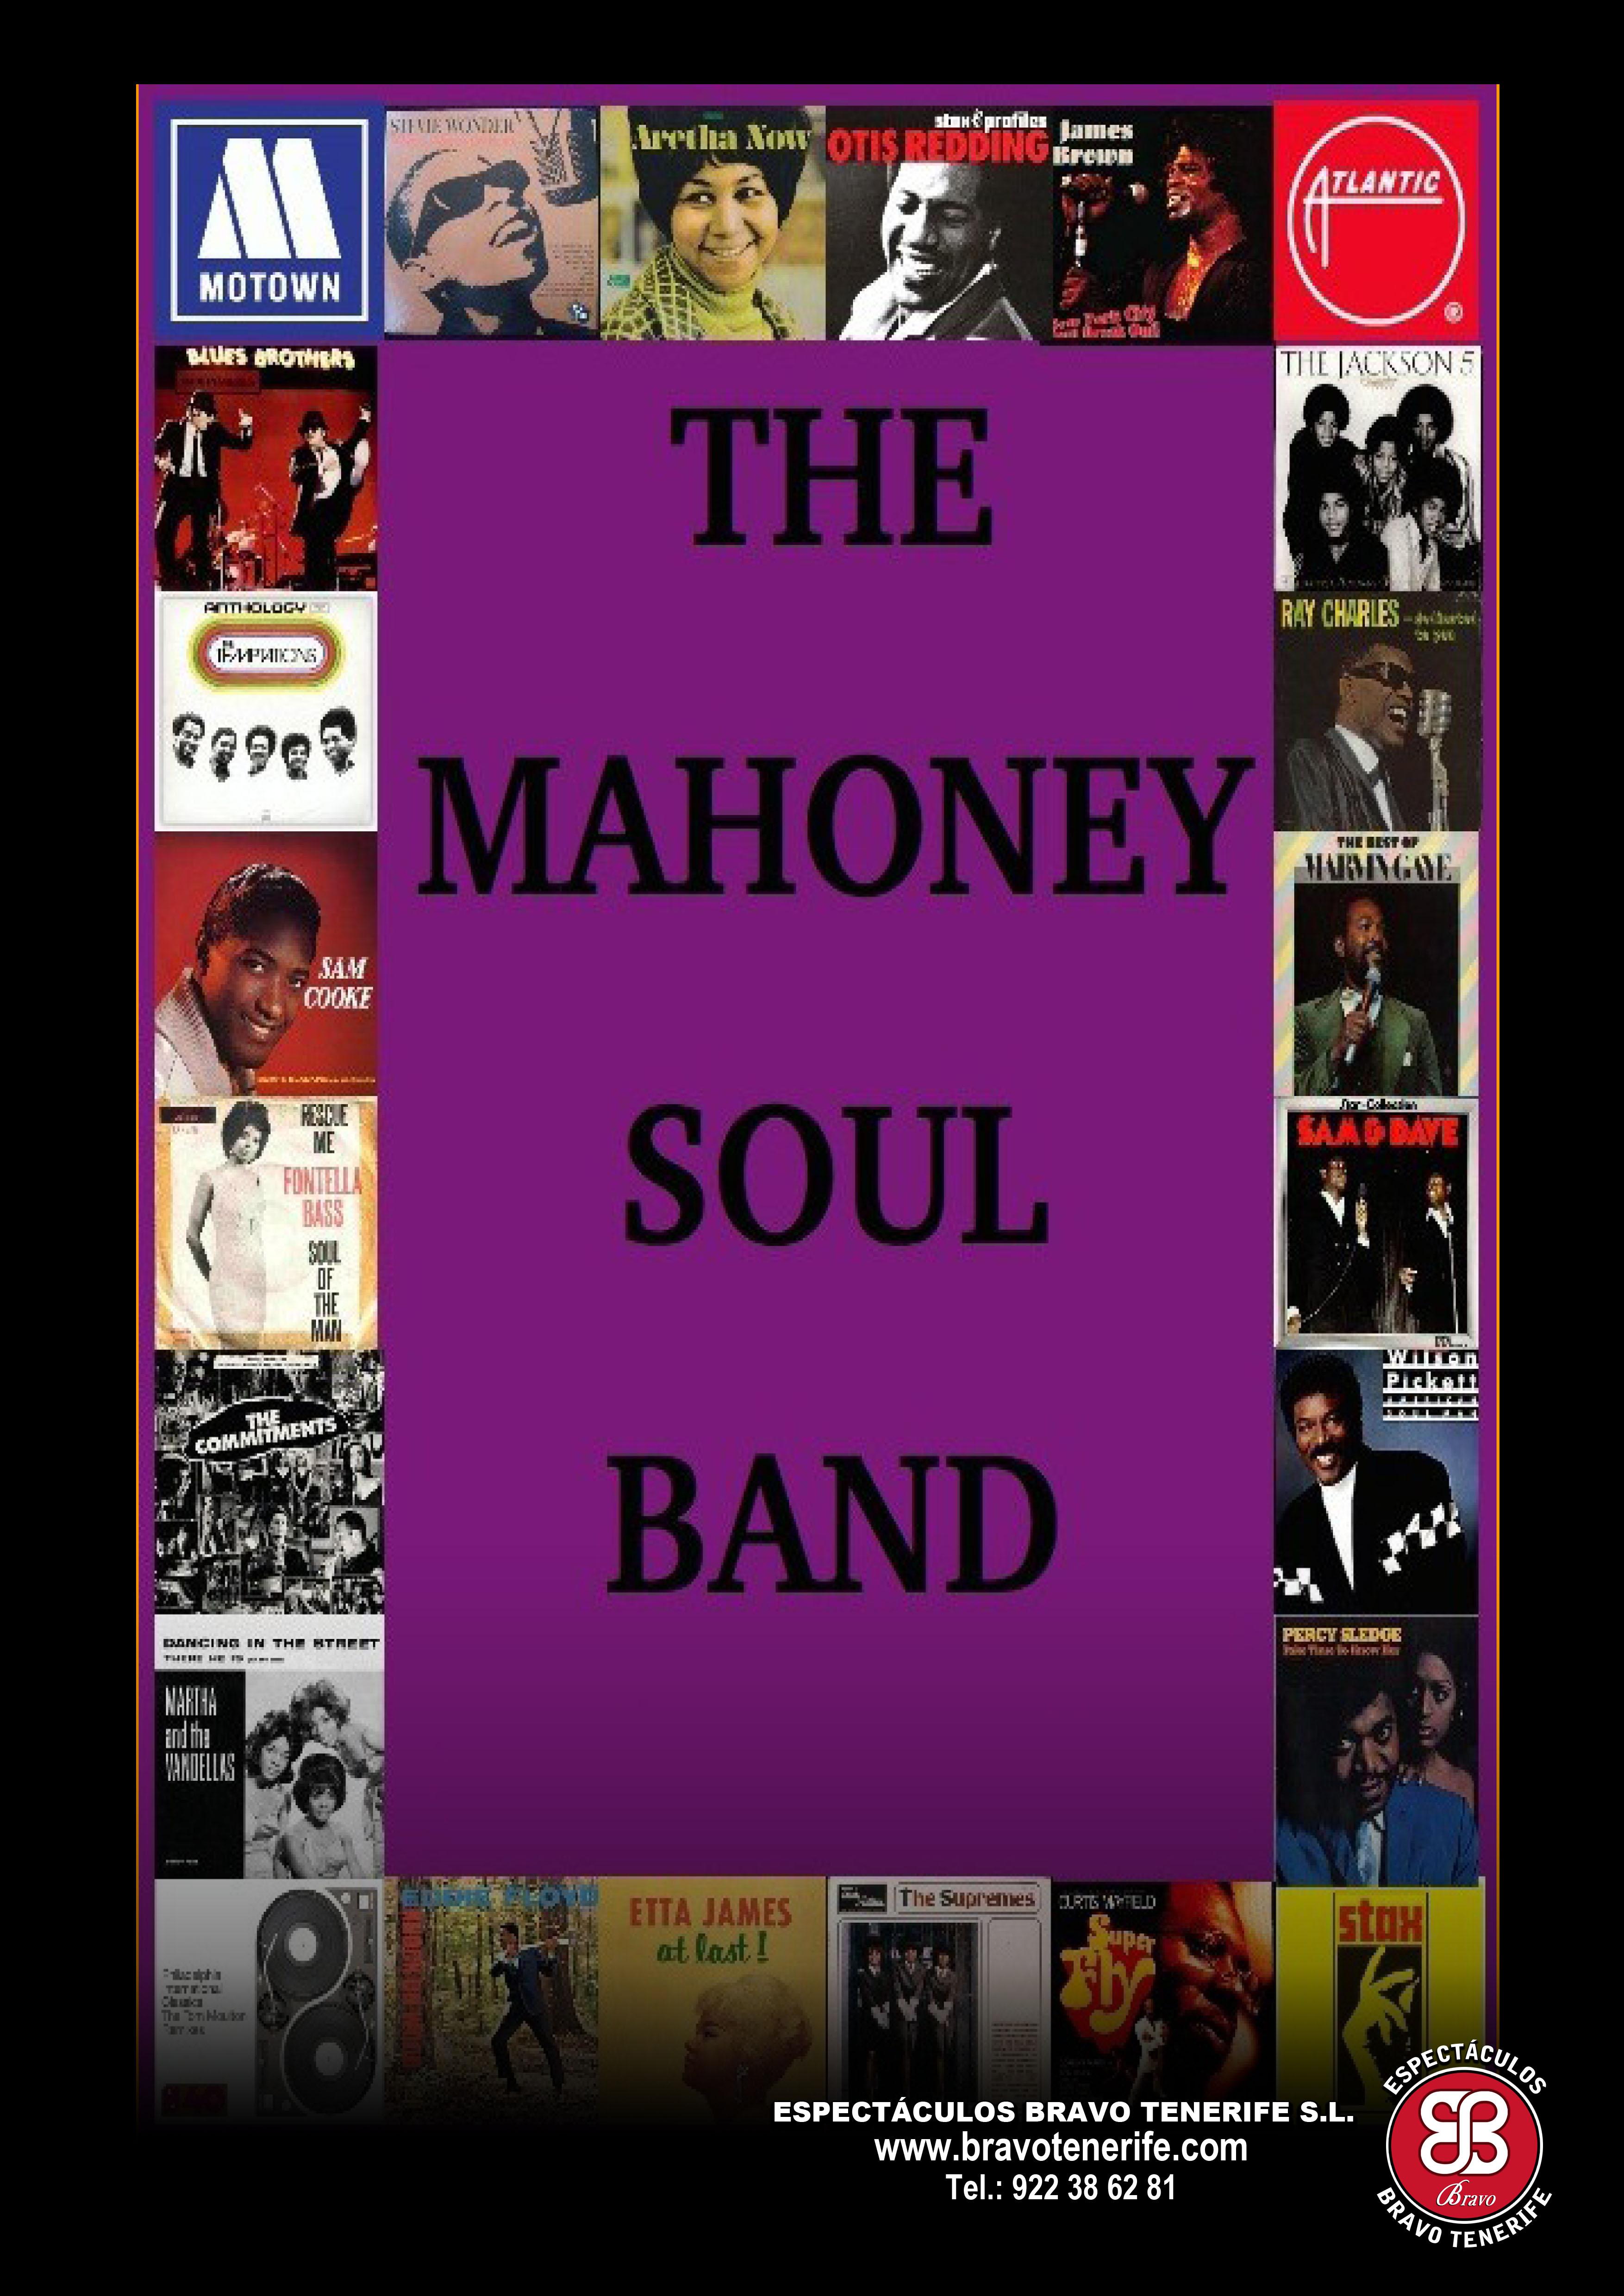 Mahoney Soul band Bravo